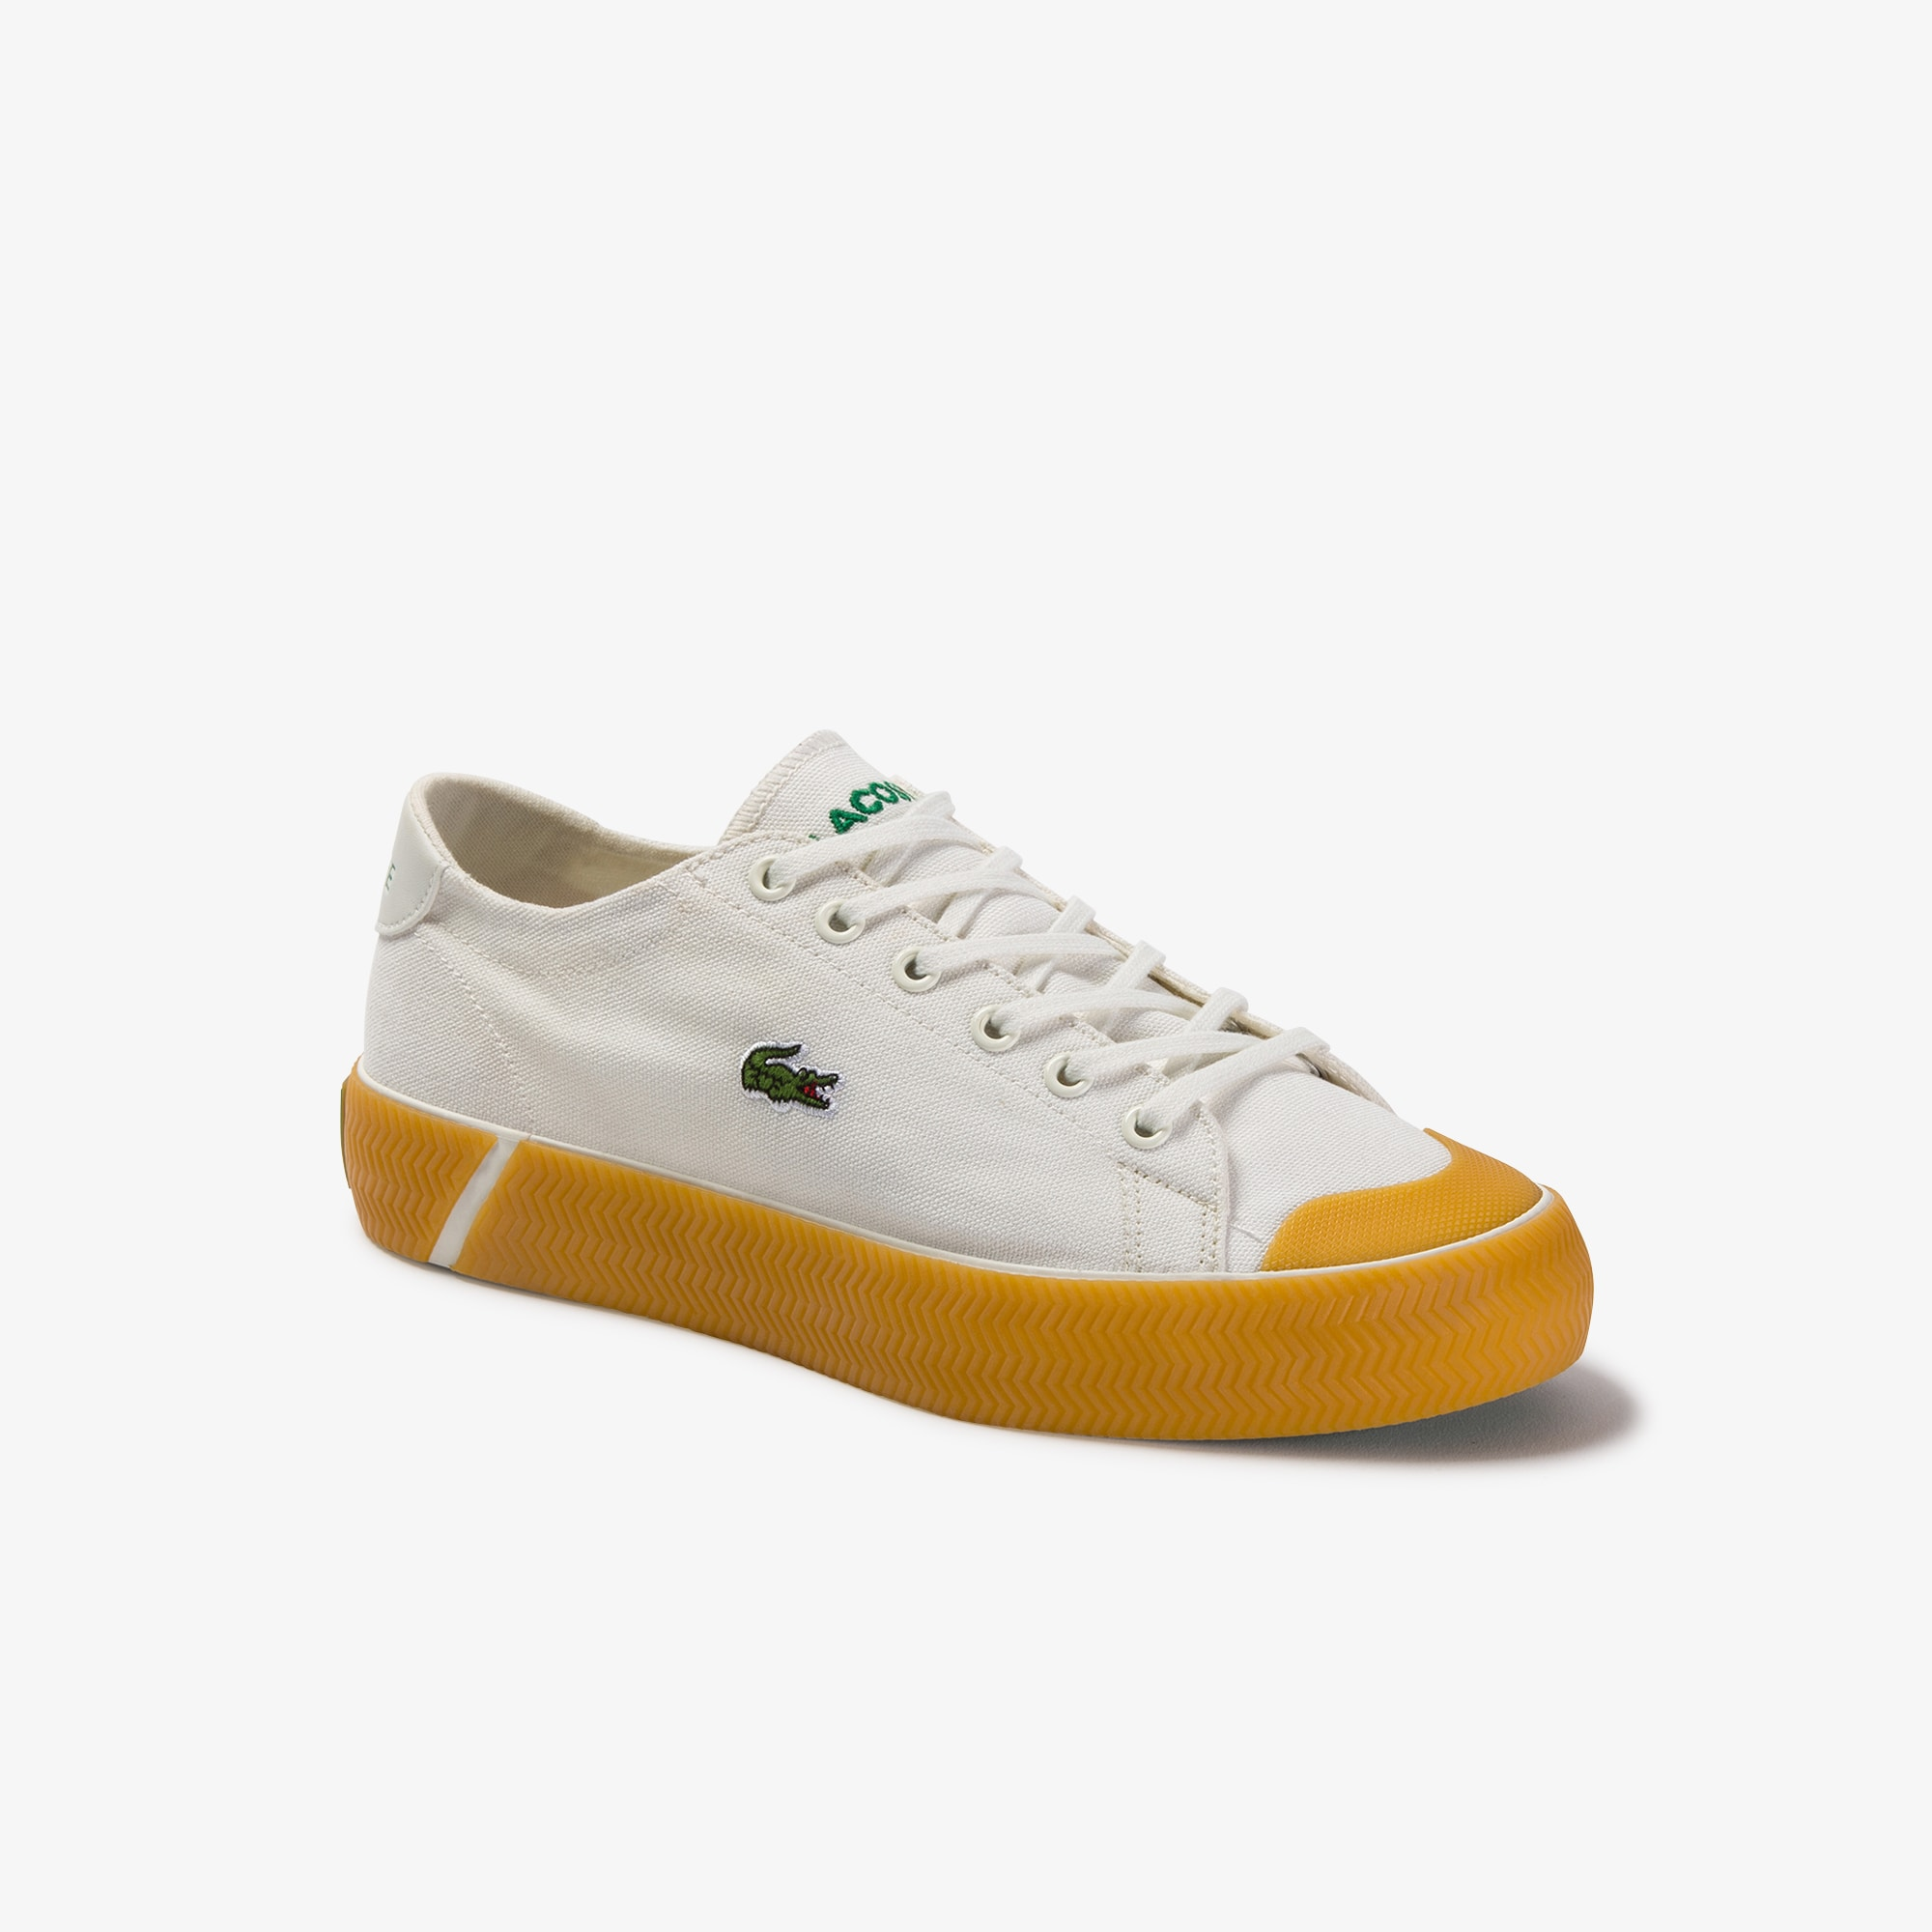 Economico - lacoste shoes online india